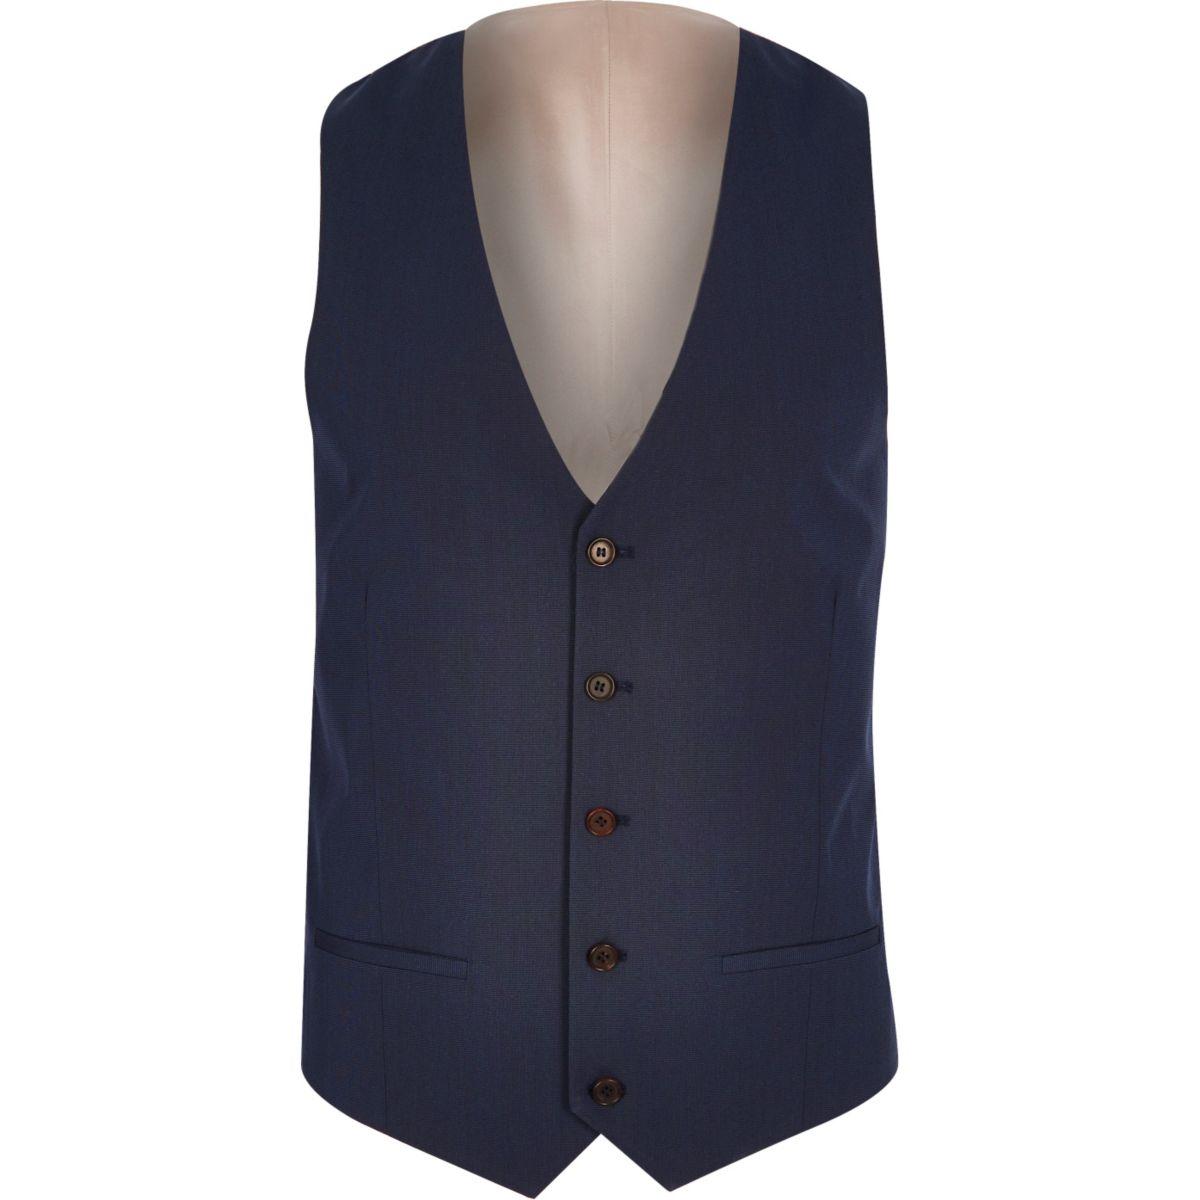 Dark blue five button waistcoat